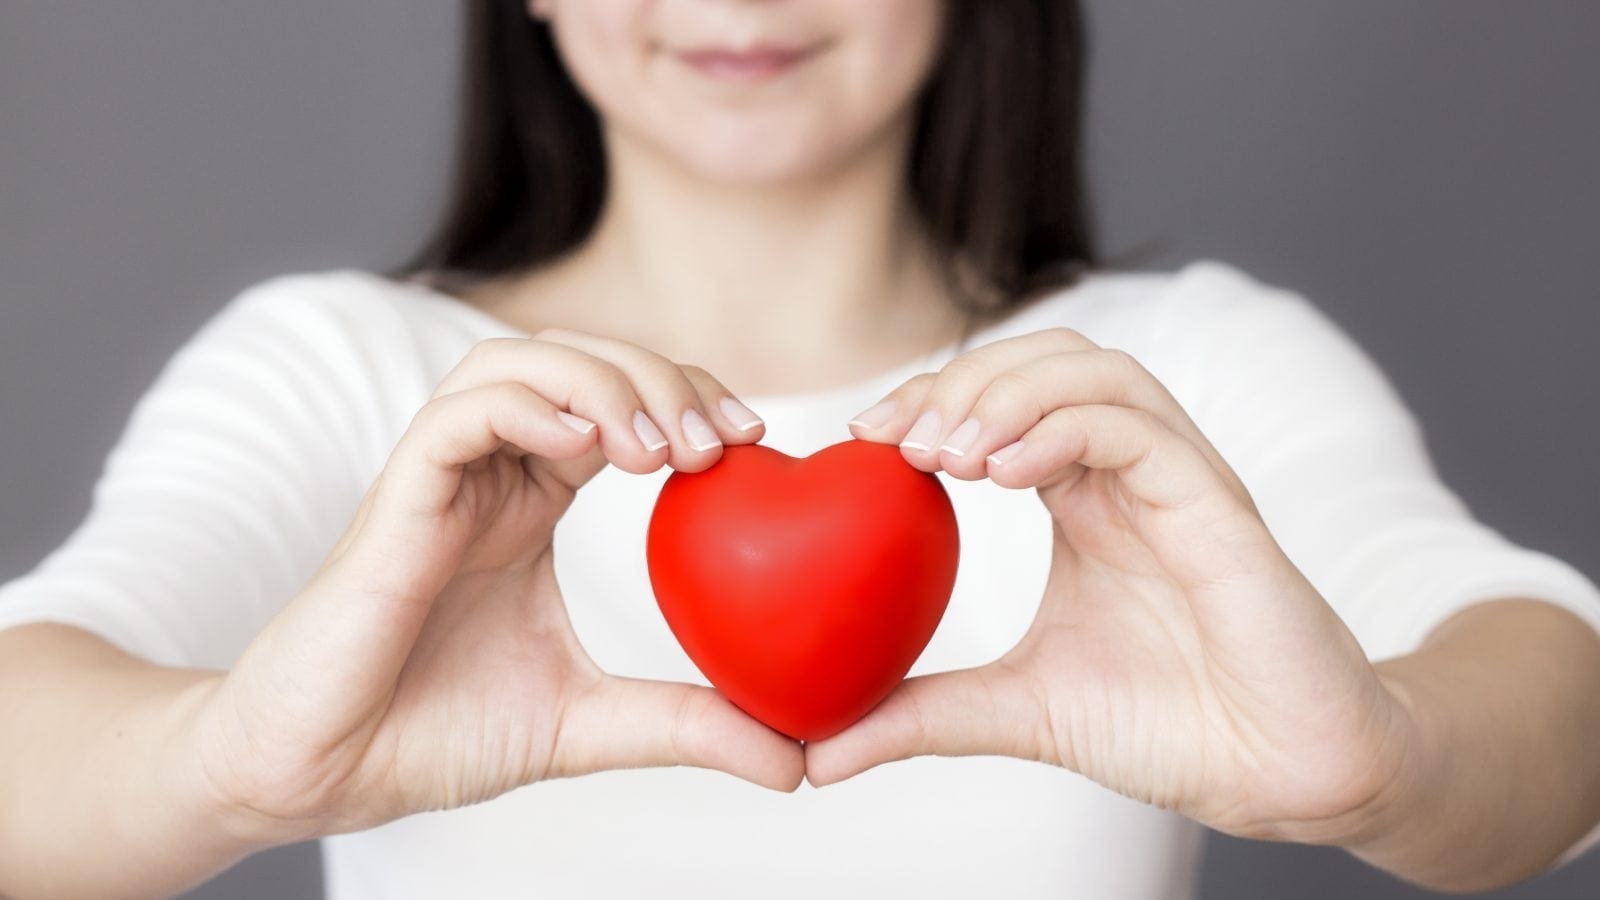 congenital heart disease stock photo